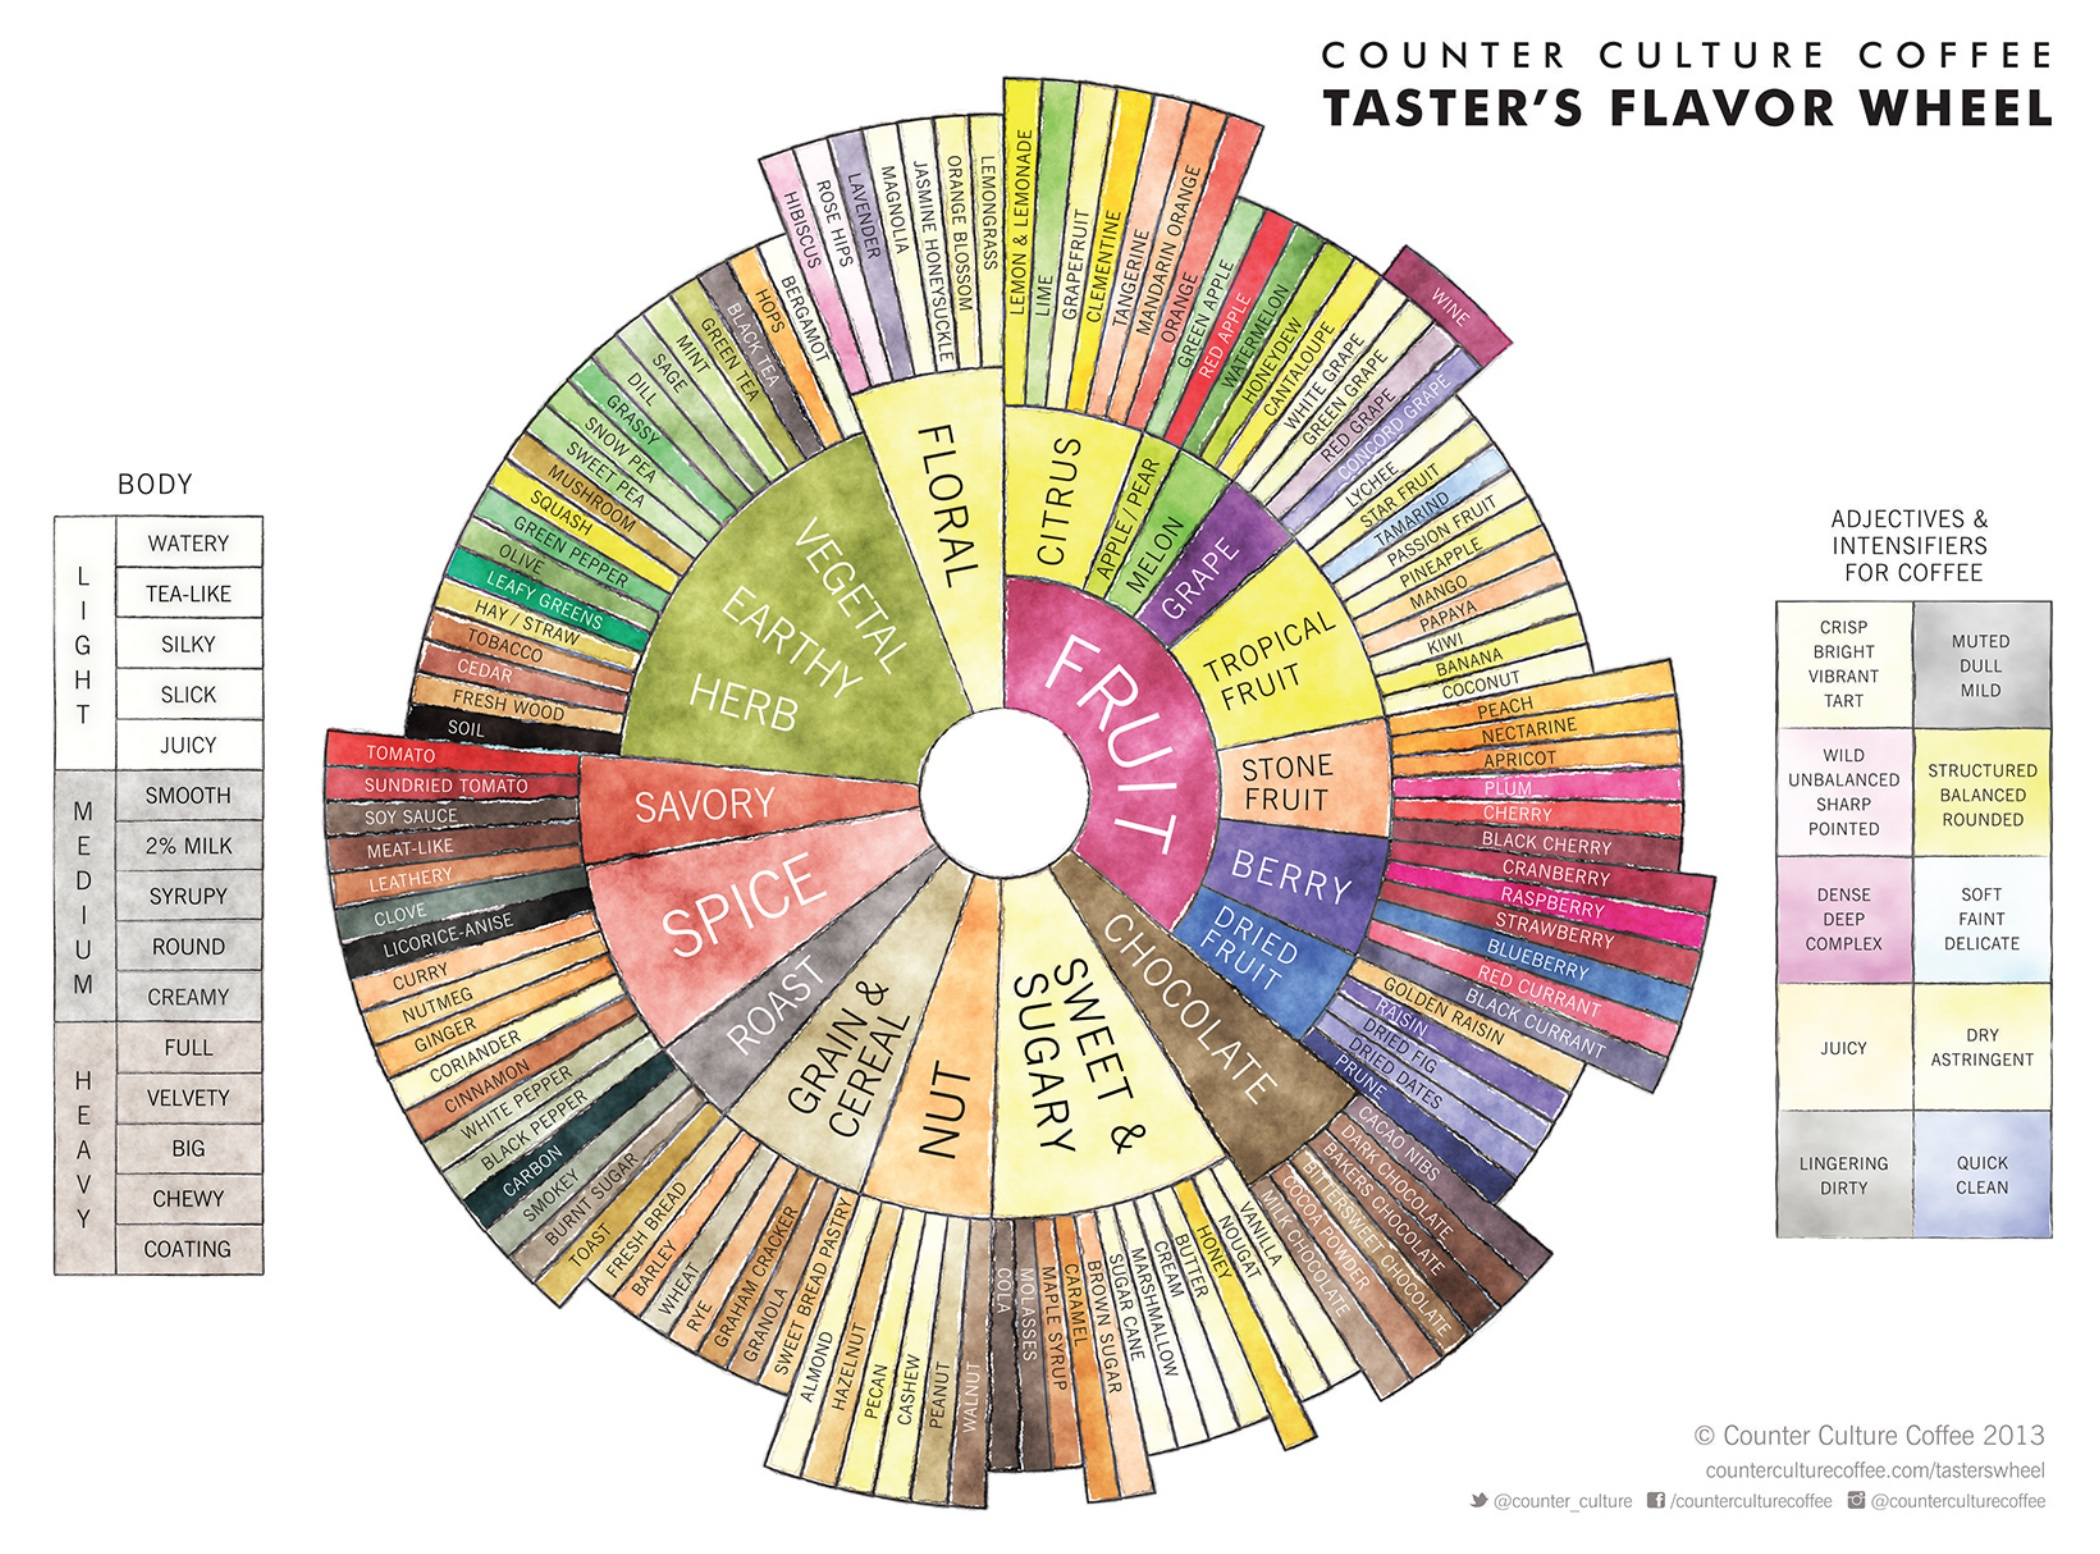 The Coffee Taster s Flavor Wheel